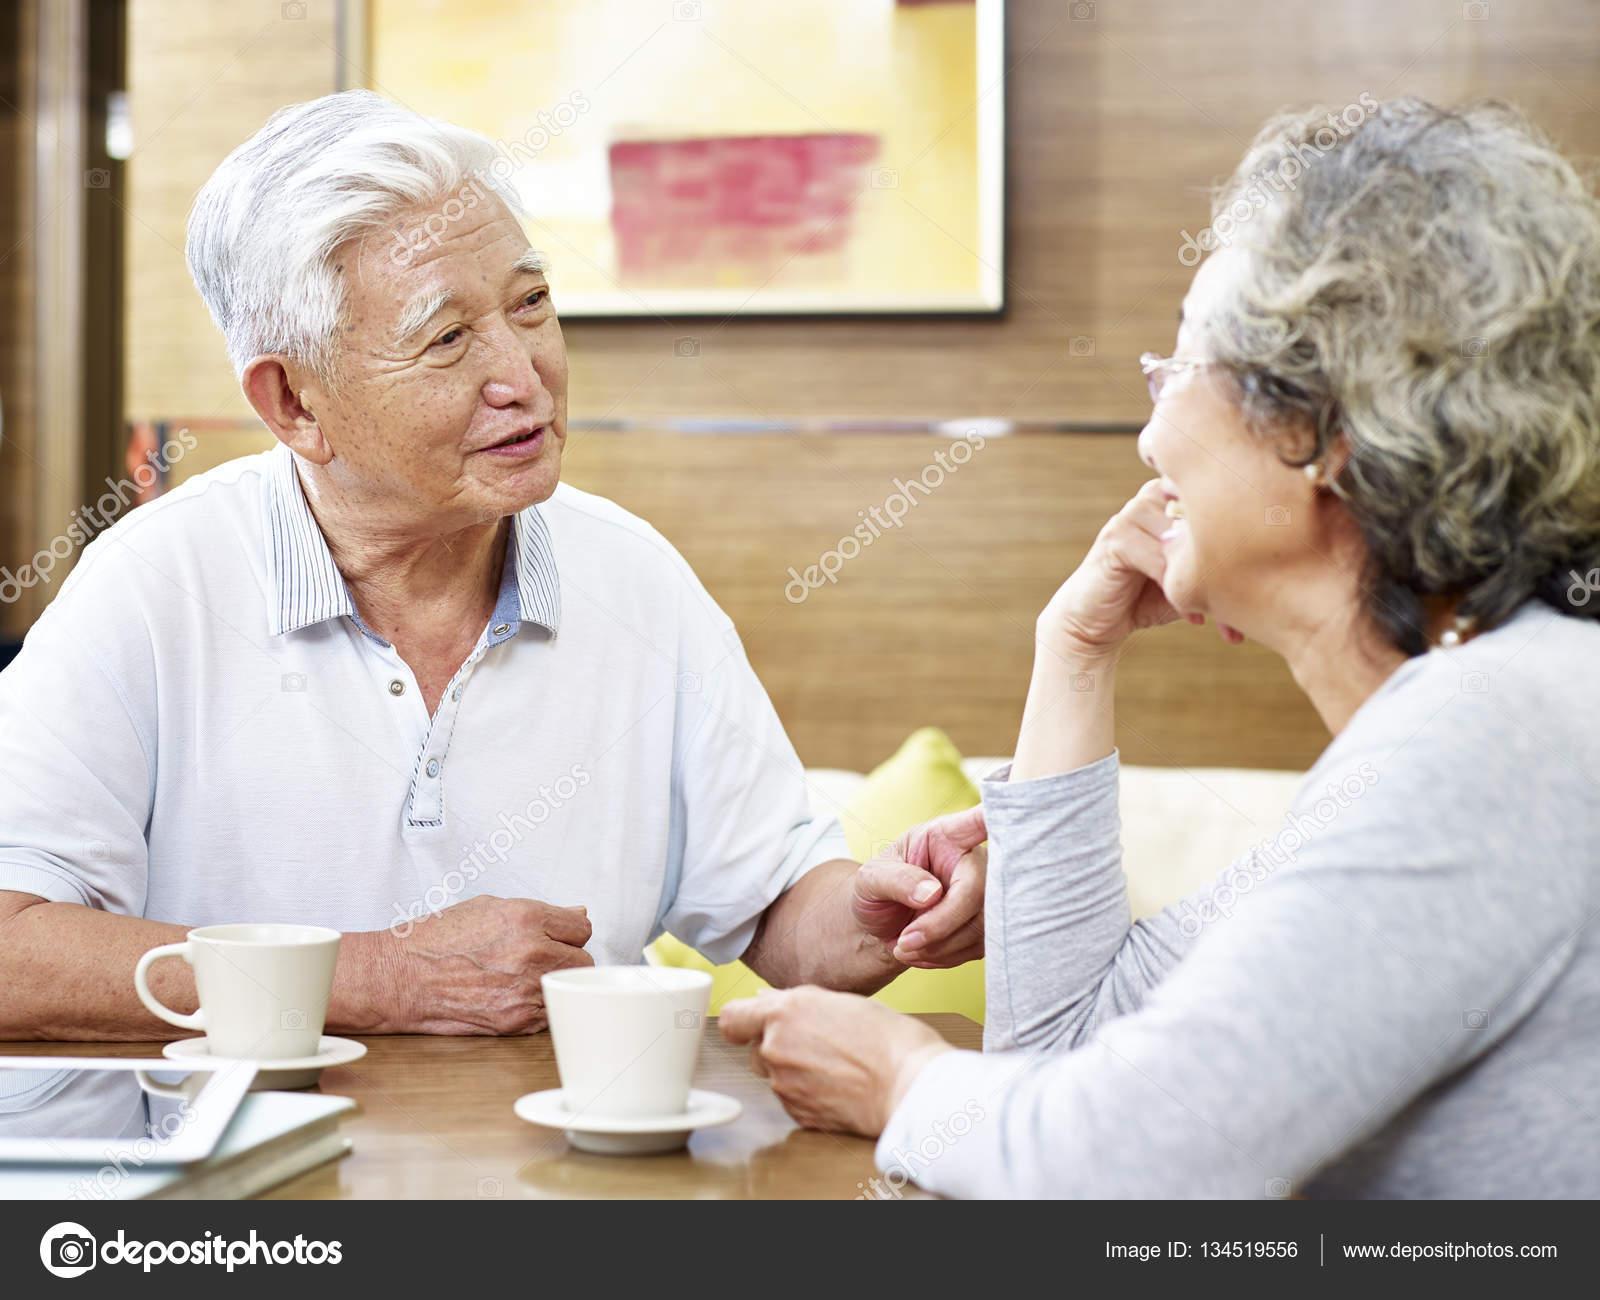 Senior chats